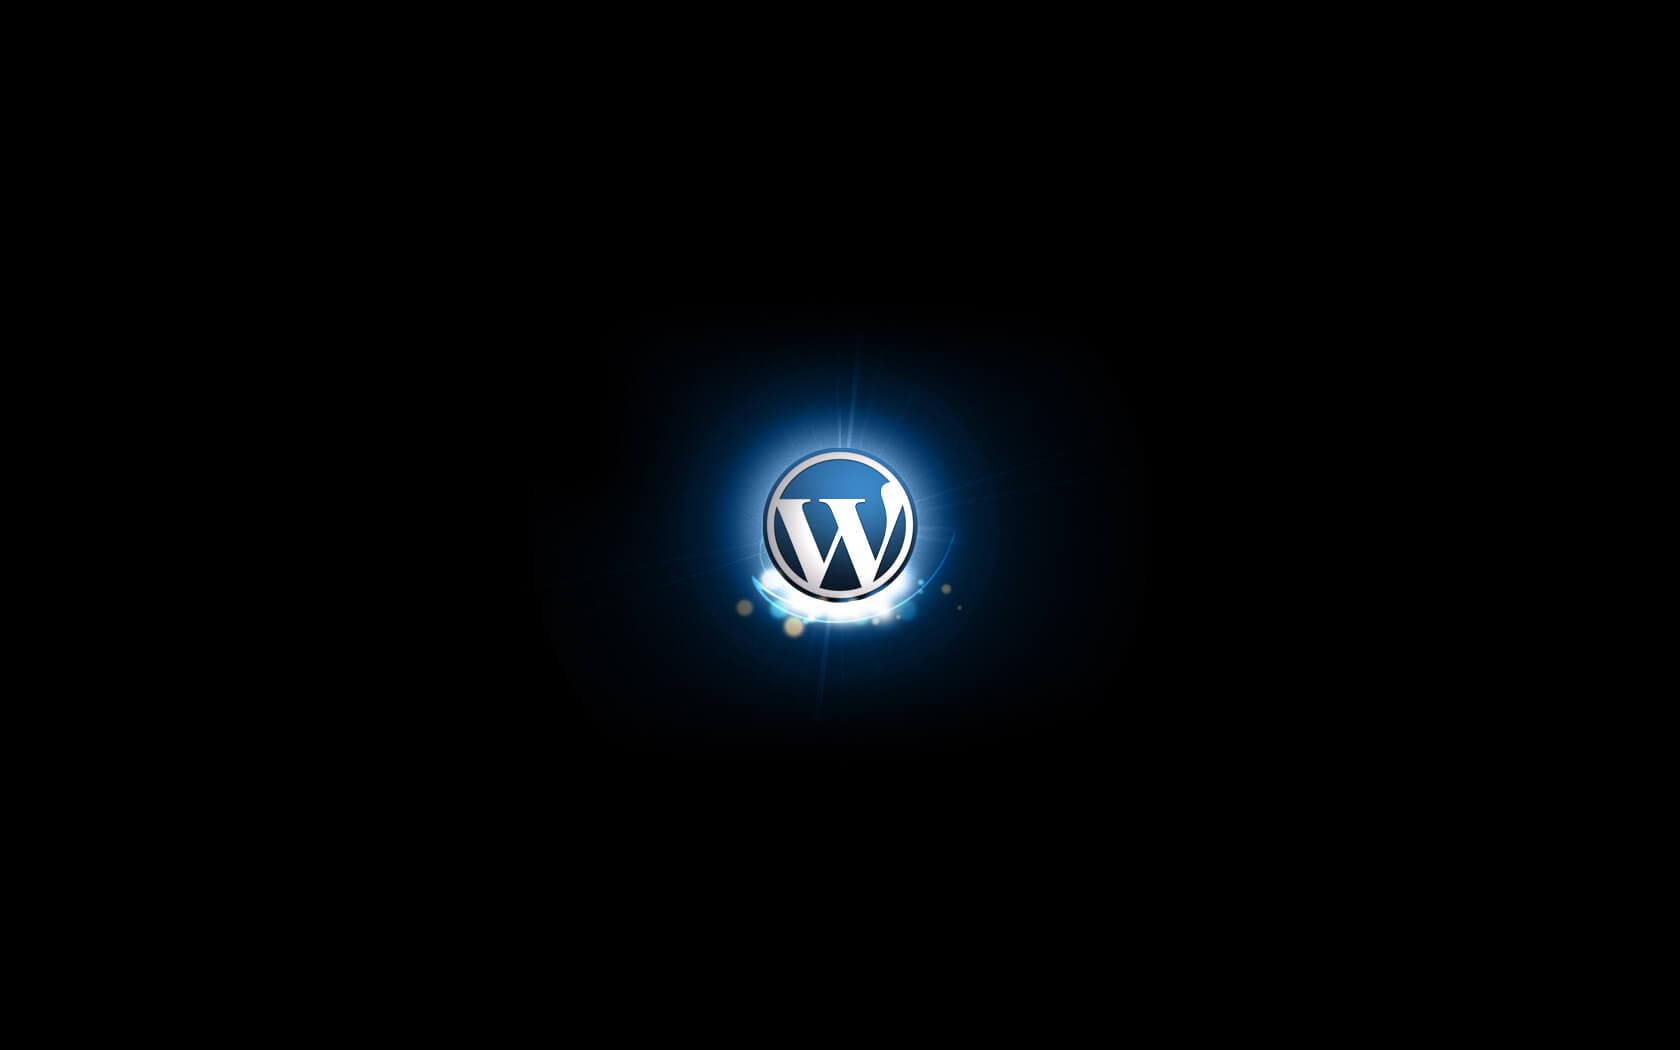 WordPress-Wallpaper-5